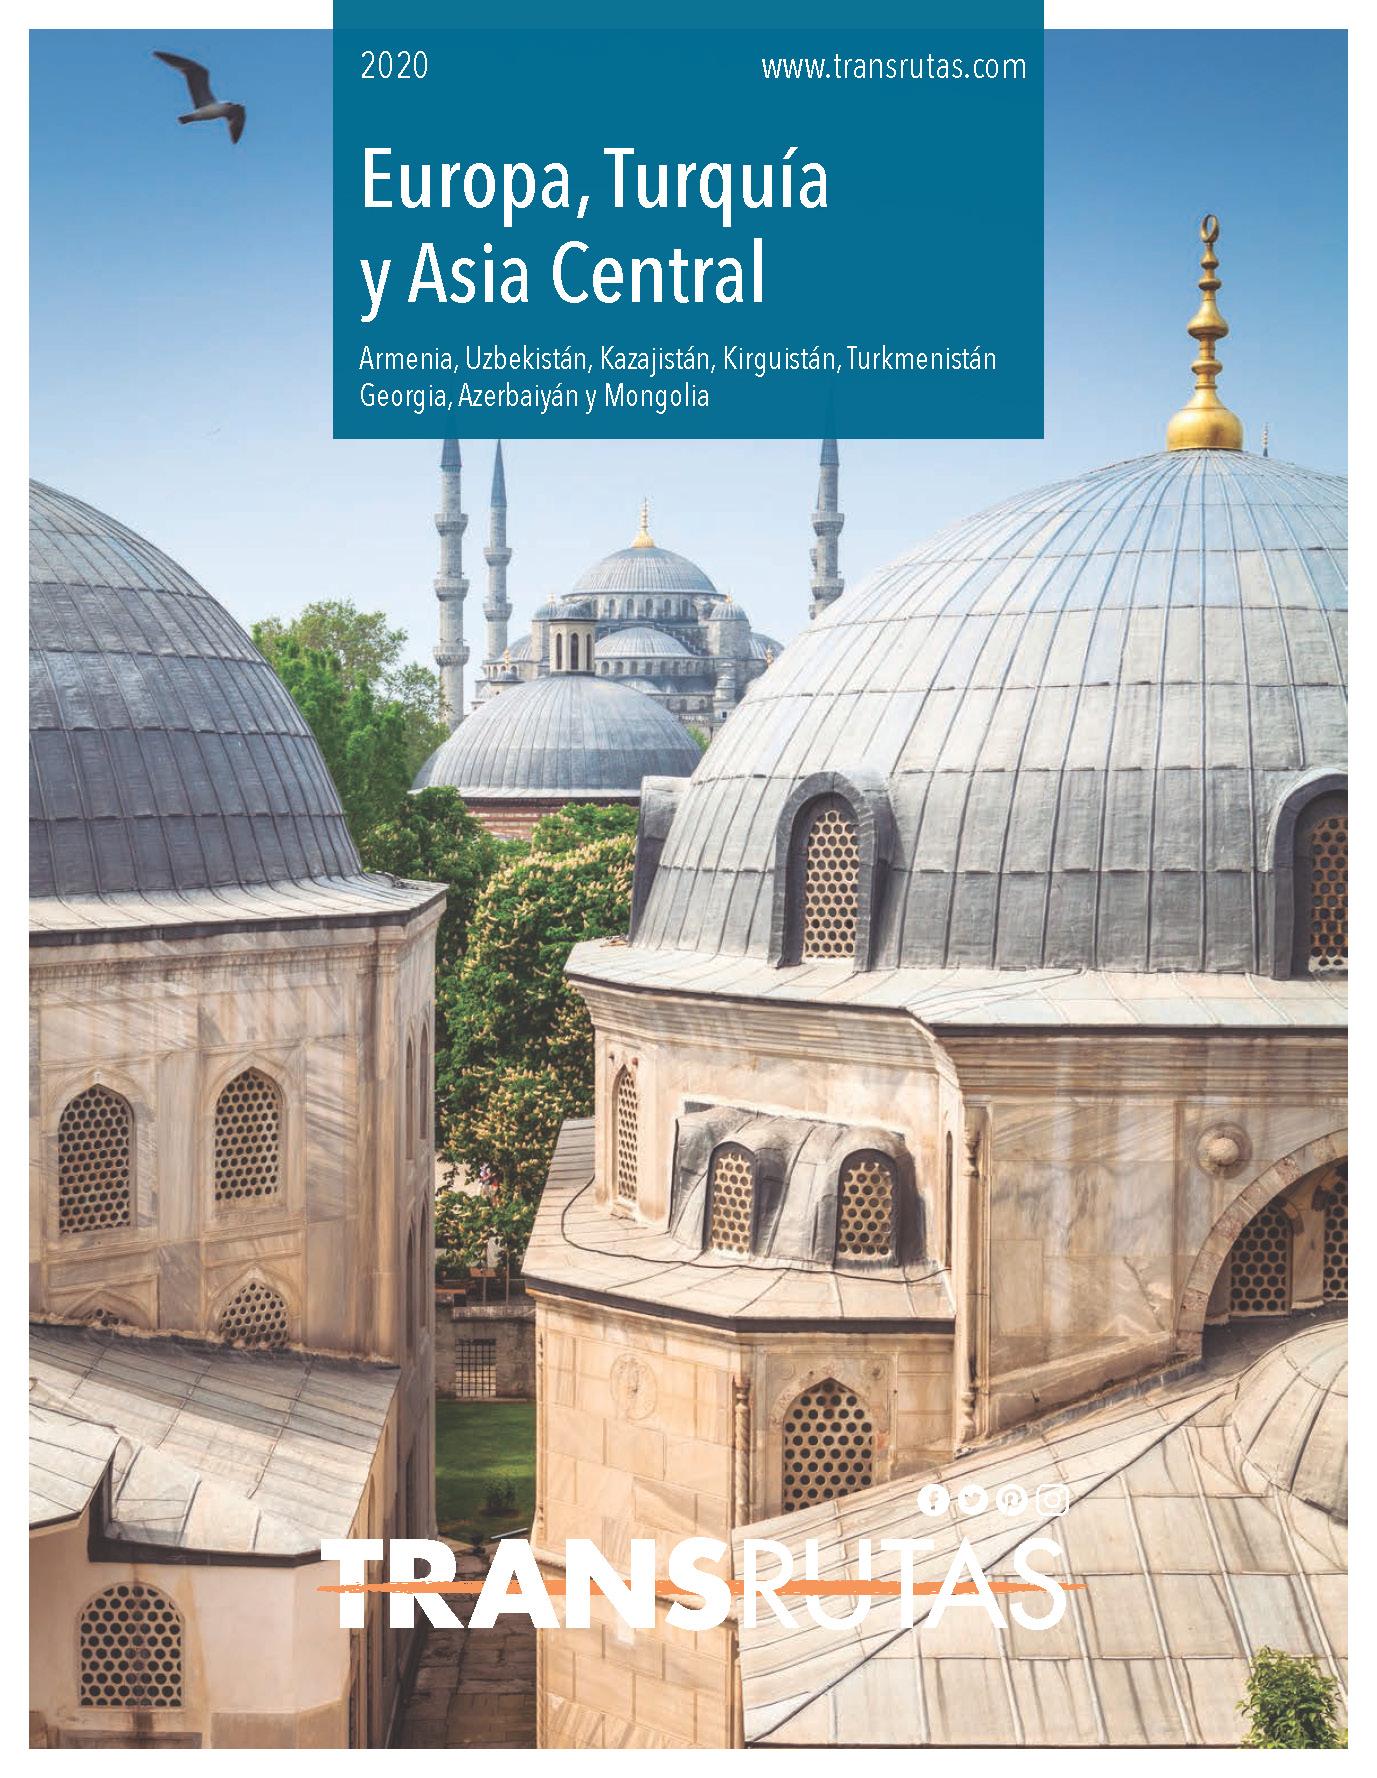 Catalogo Transrutas Europa Turquia y Asia Central 2020